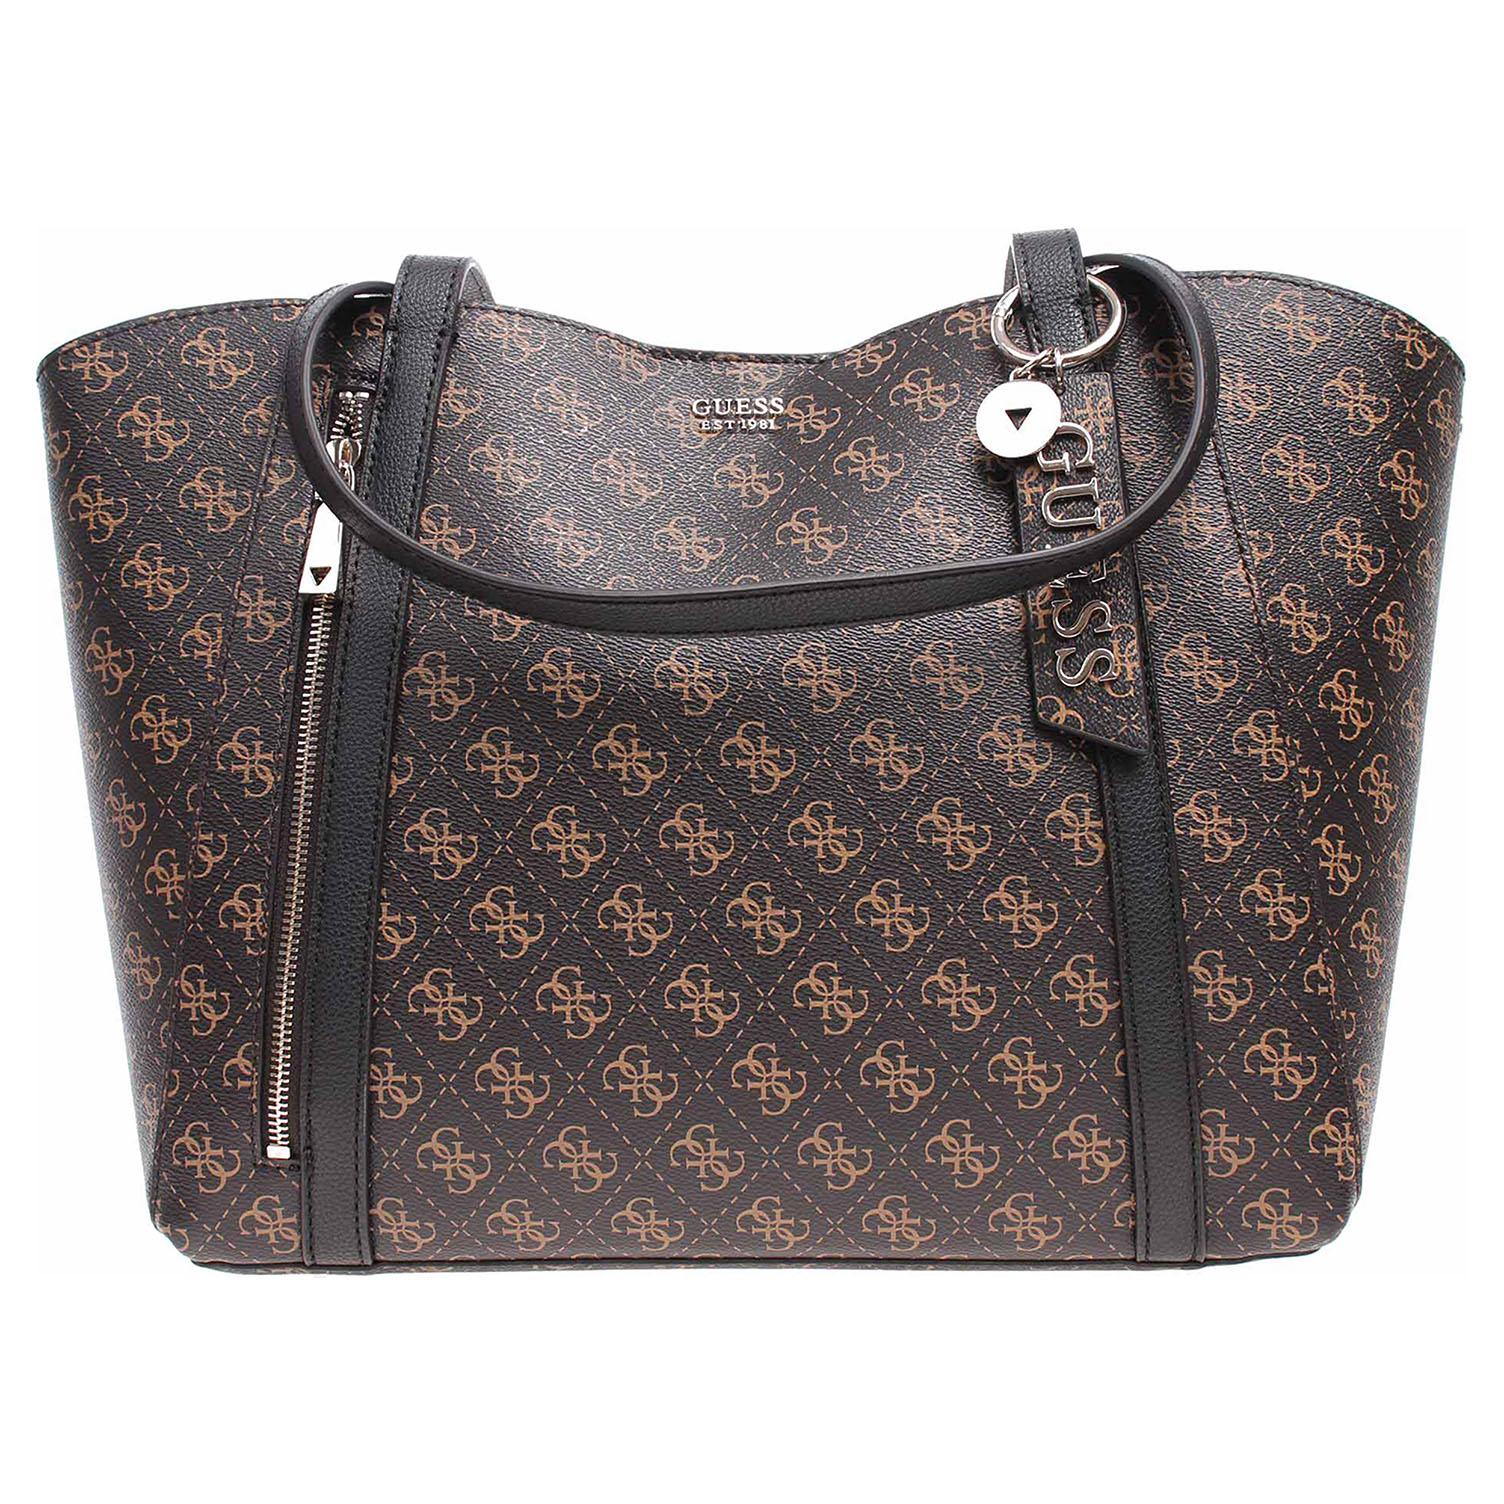 Ecco Guess dámská kabelka QL788123 brown-black 11891809